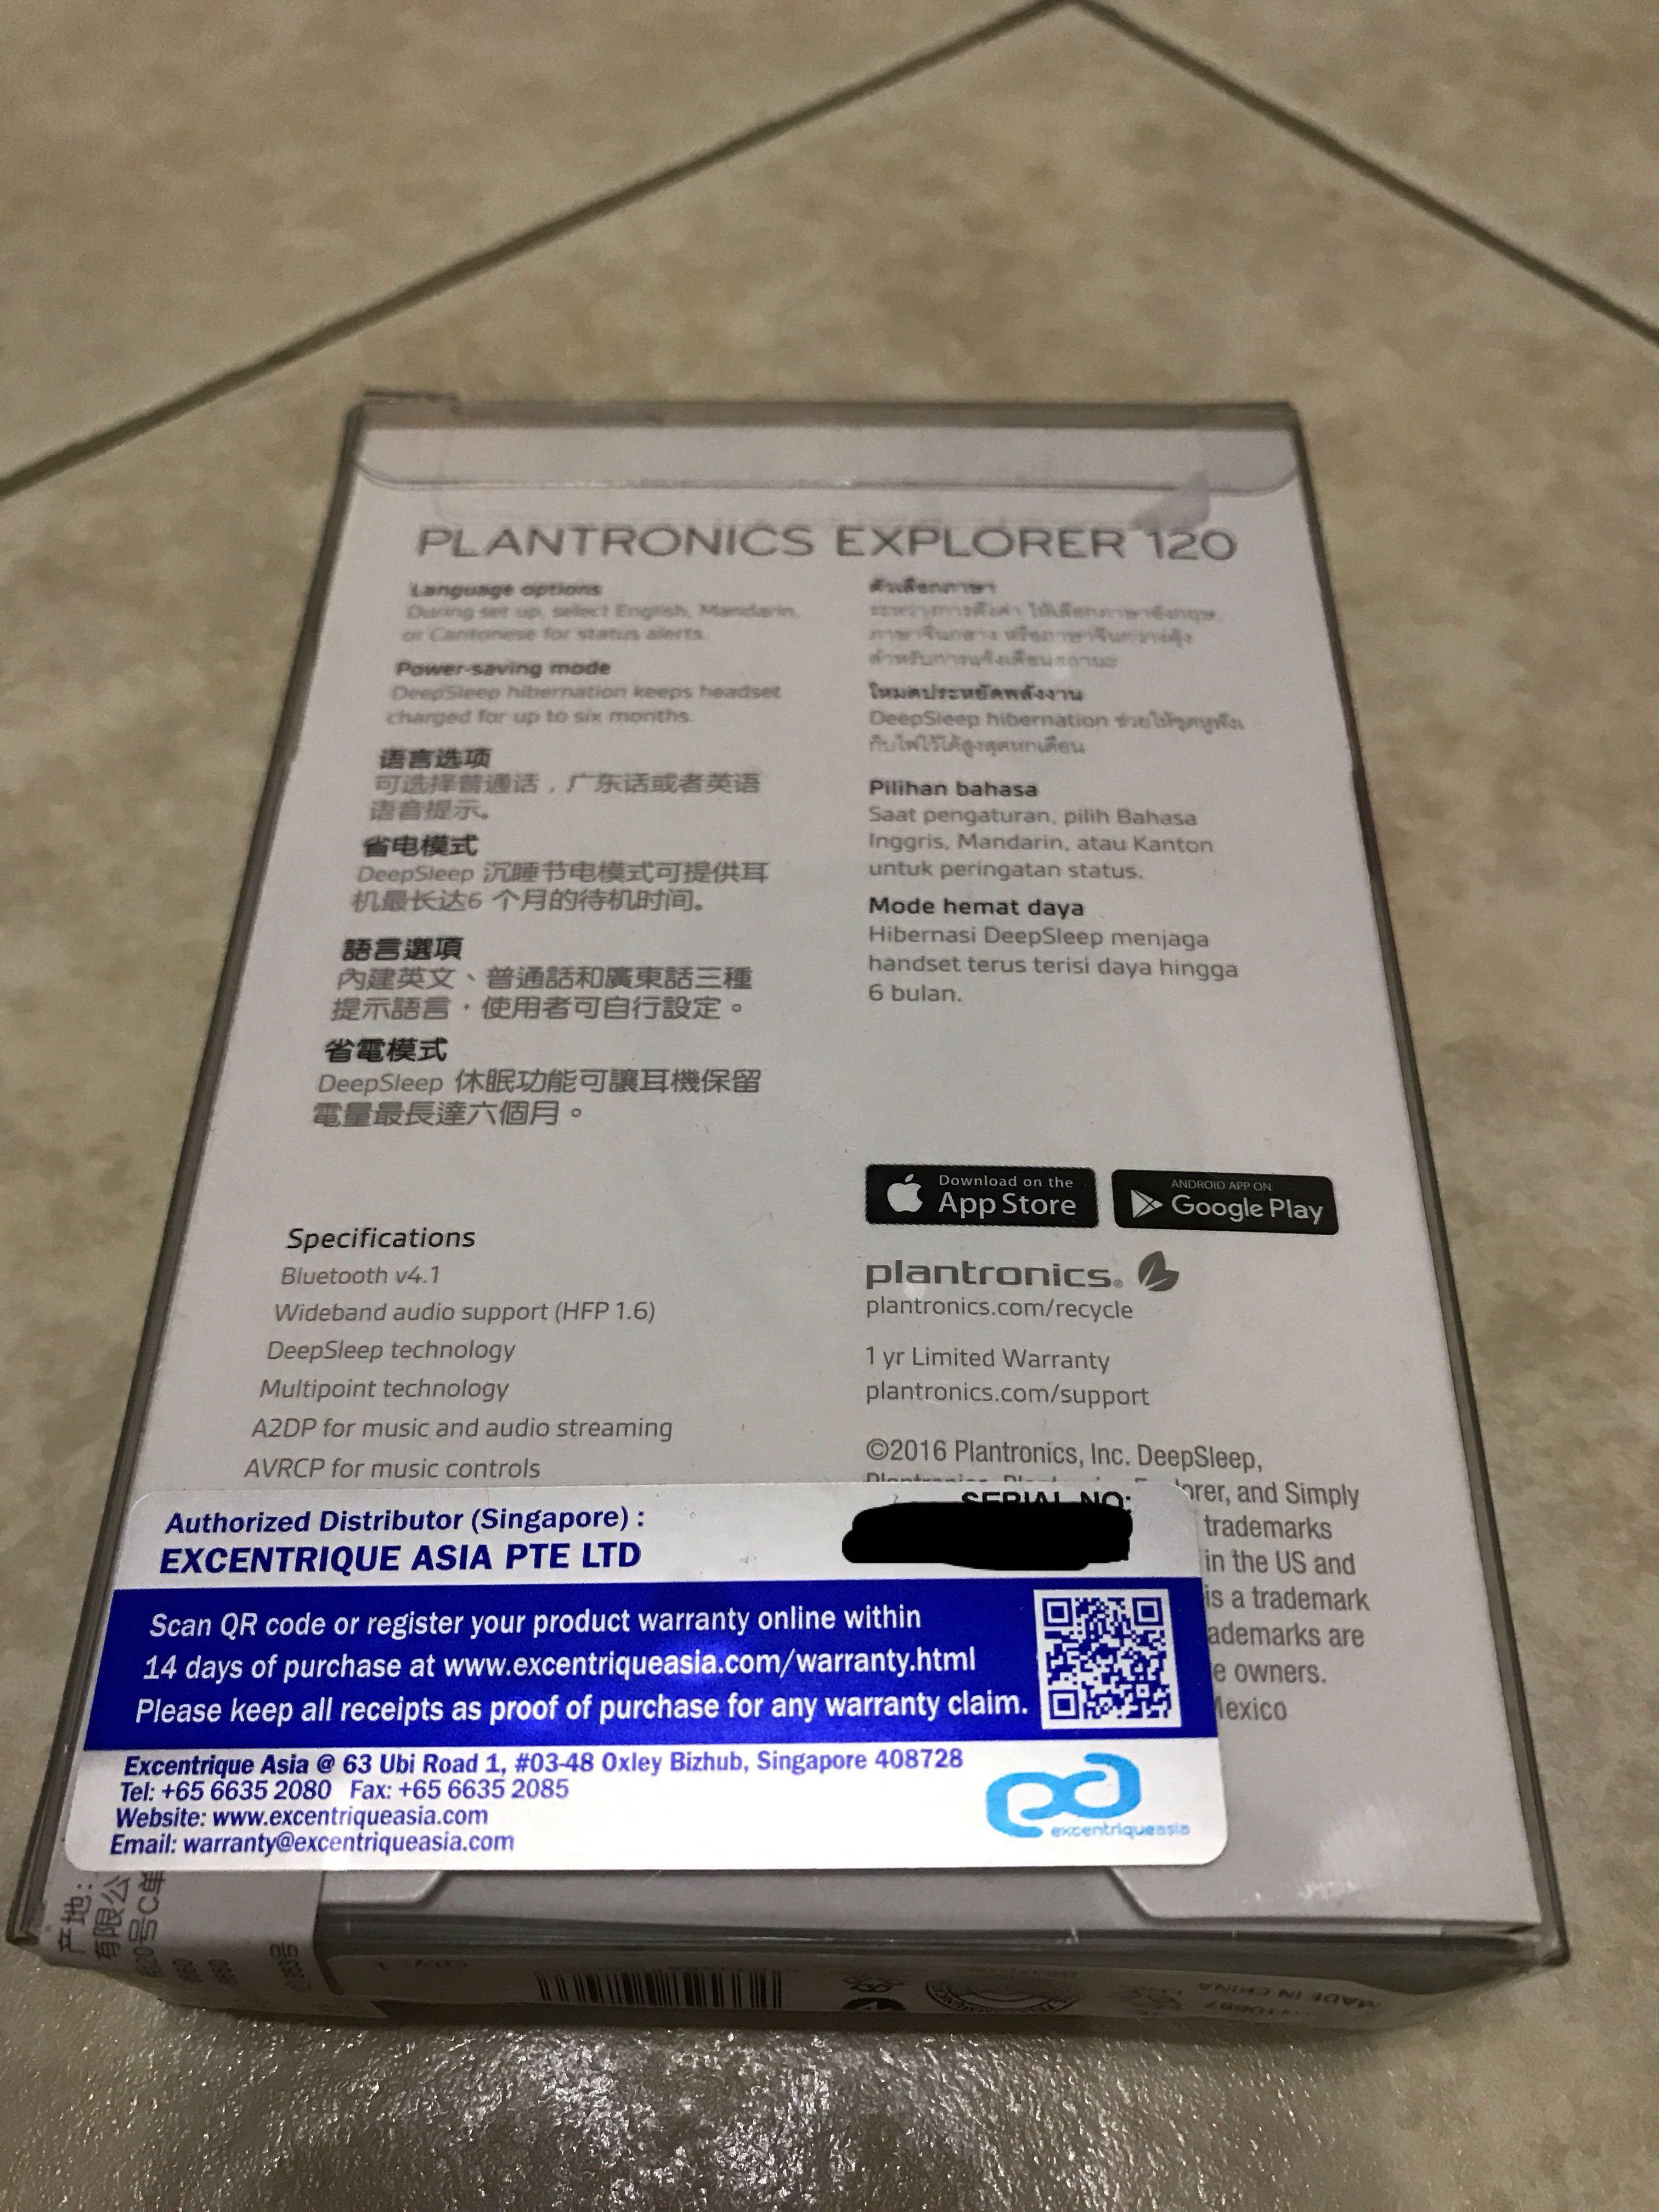 Plantronics Explorer 120 Bluetooth 4 1 Headset BNIB